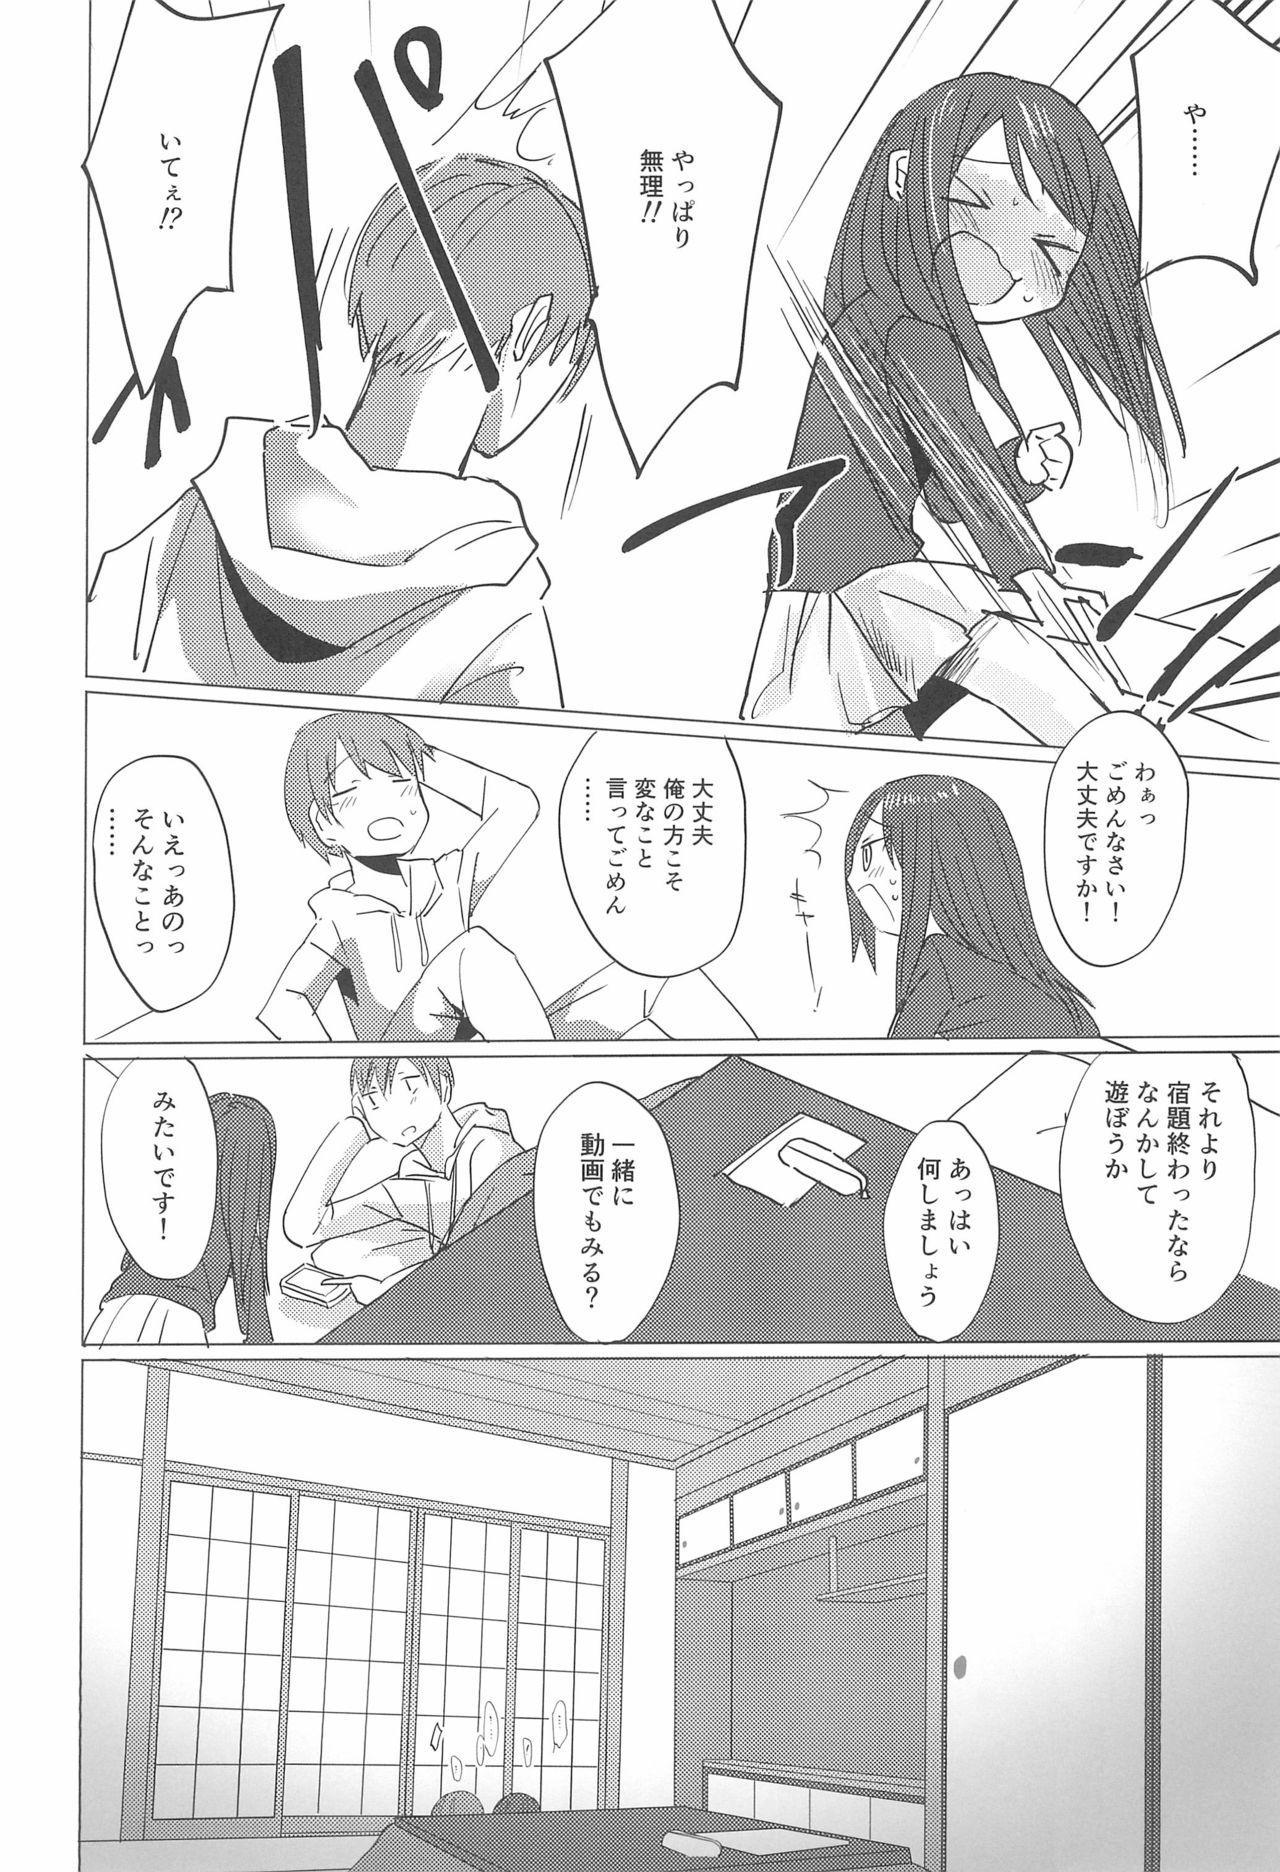 Fuyu wa Inaka ni Kaerou. 5